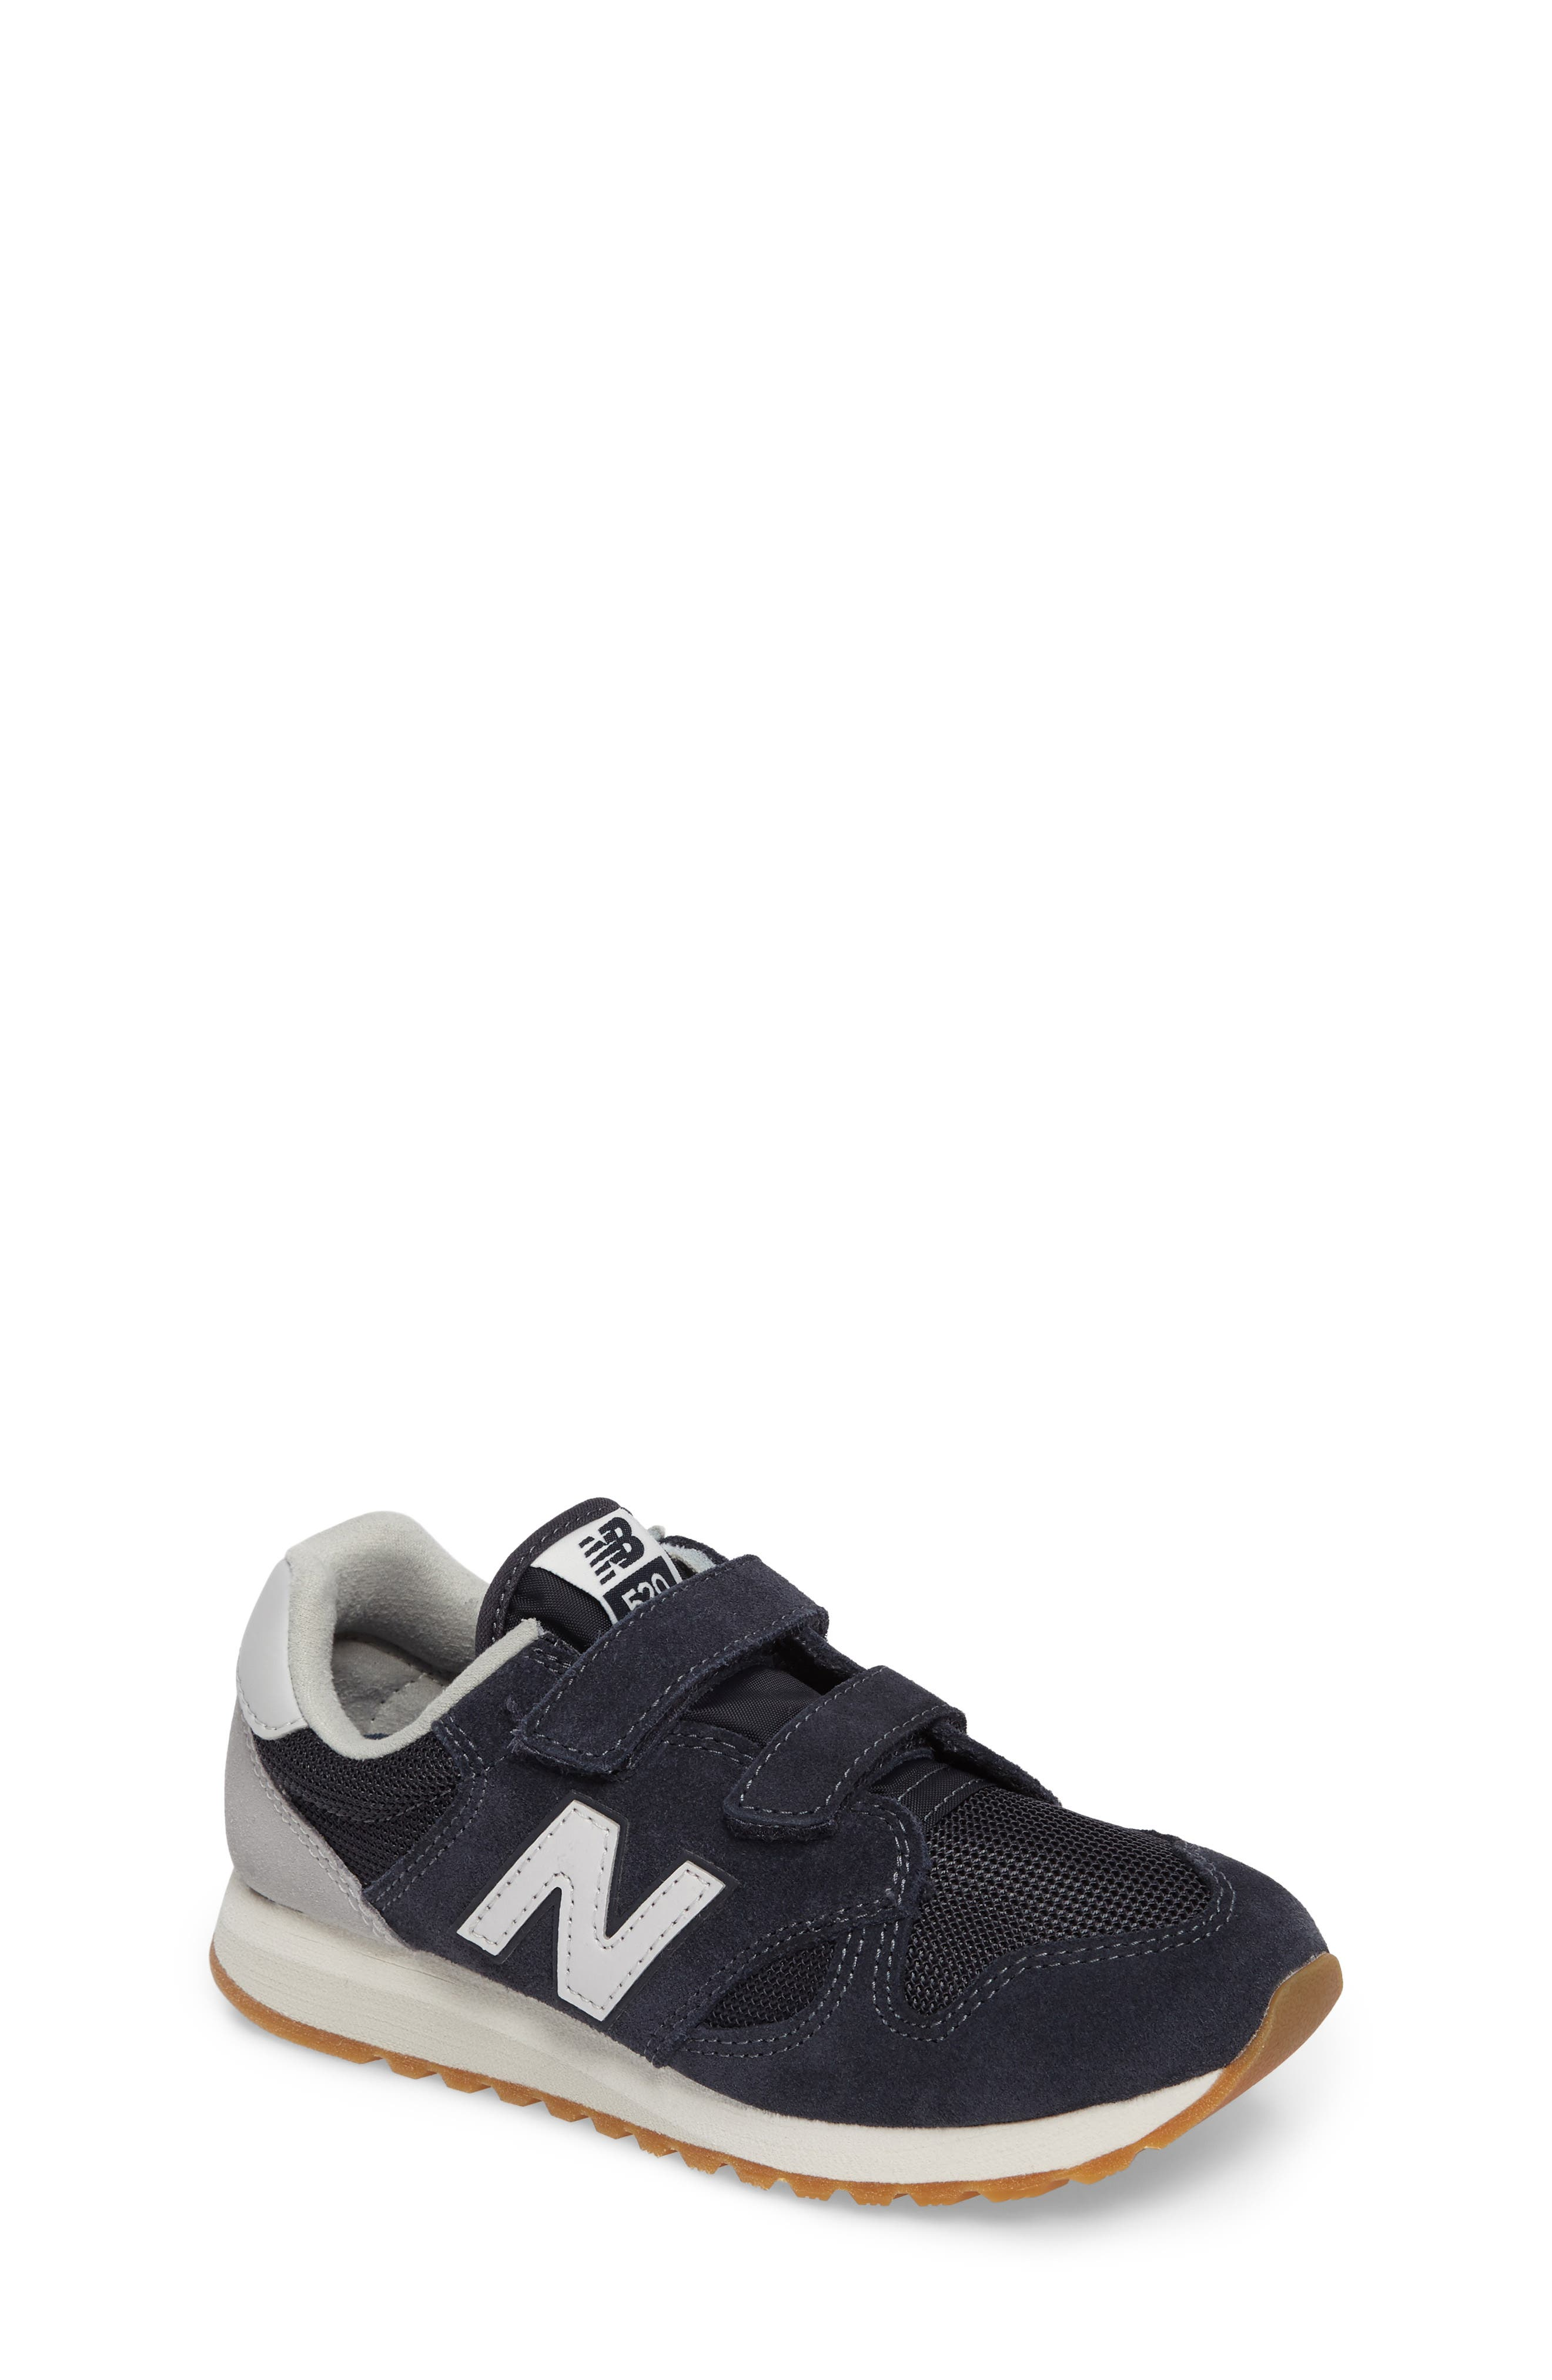 Main Image - New Balance 520 Sneaker (Baby, Walker, Toddler & Little Kid)